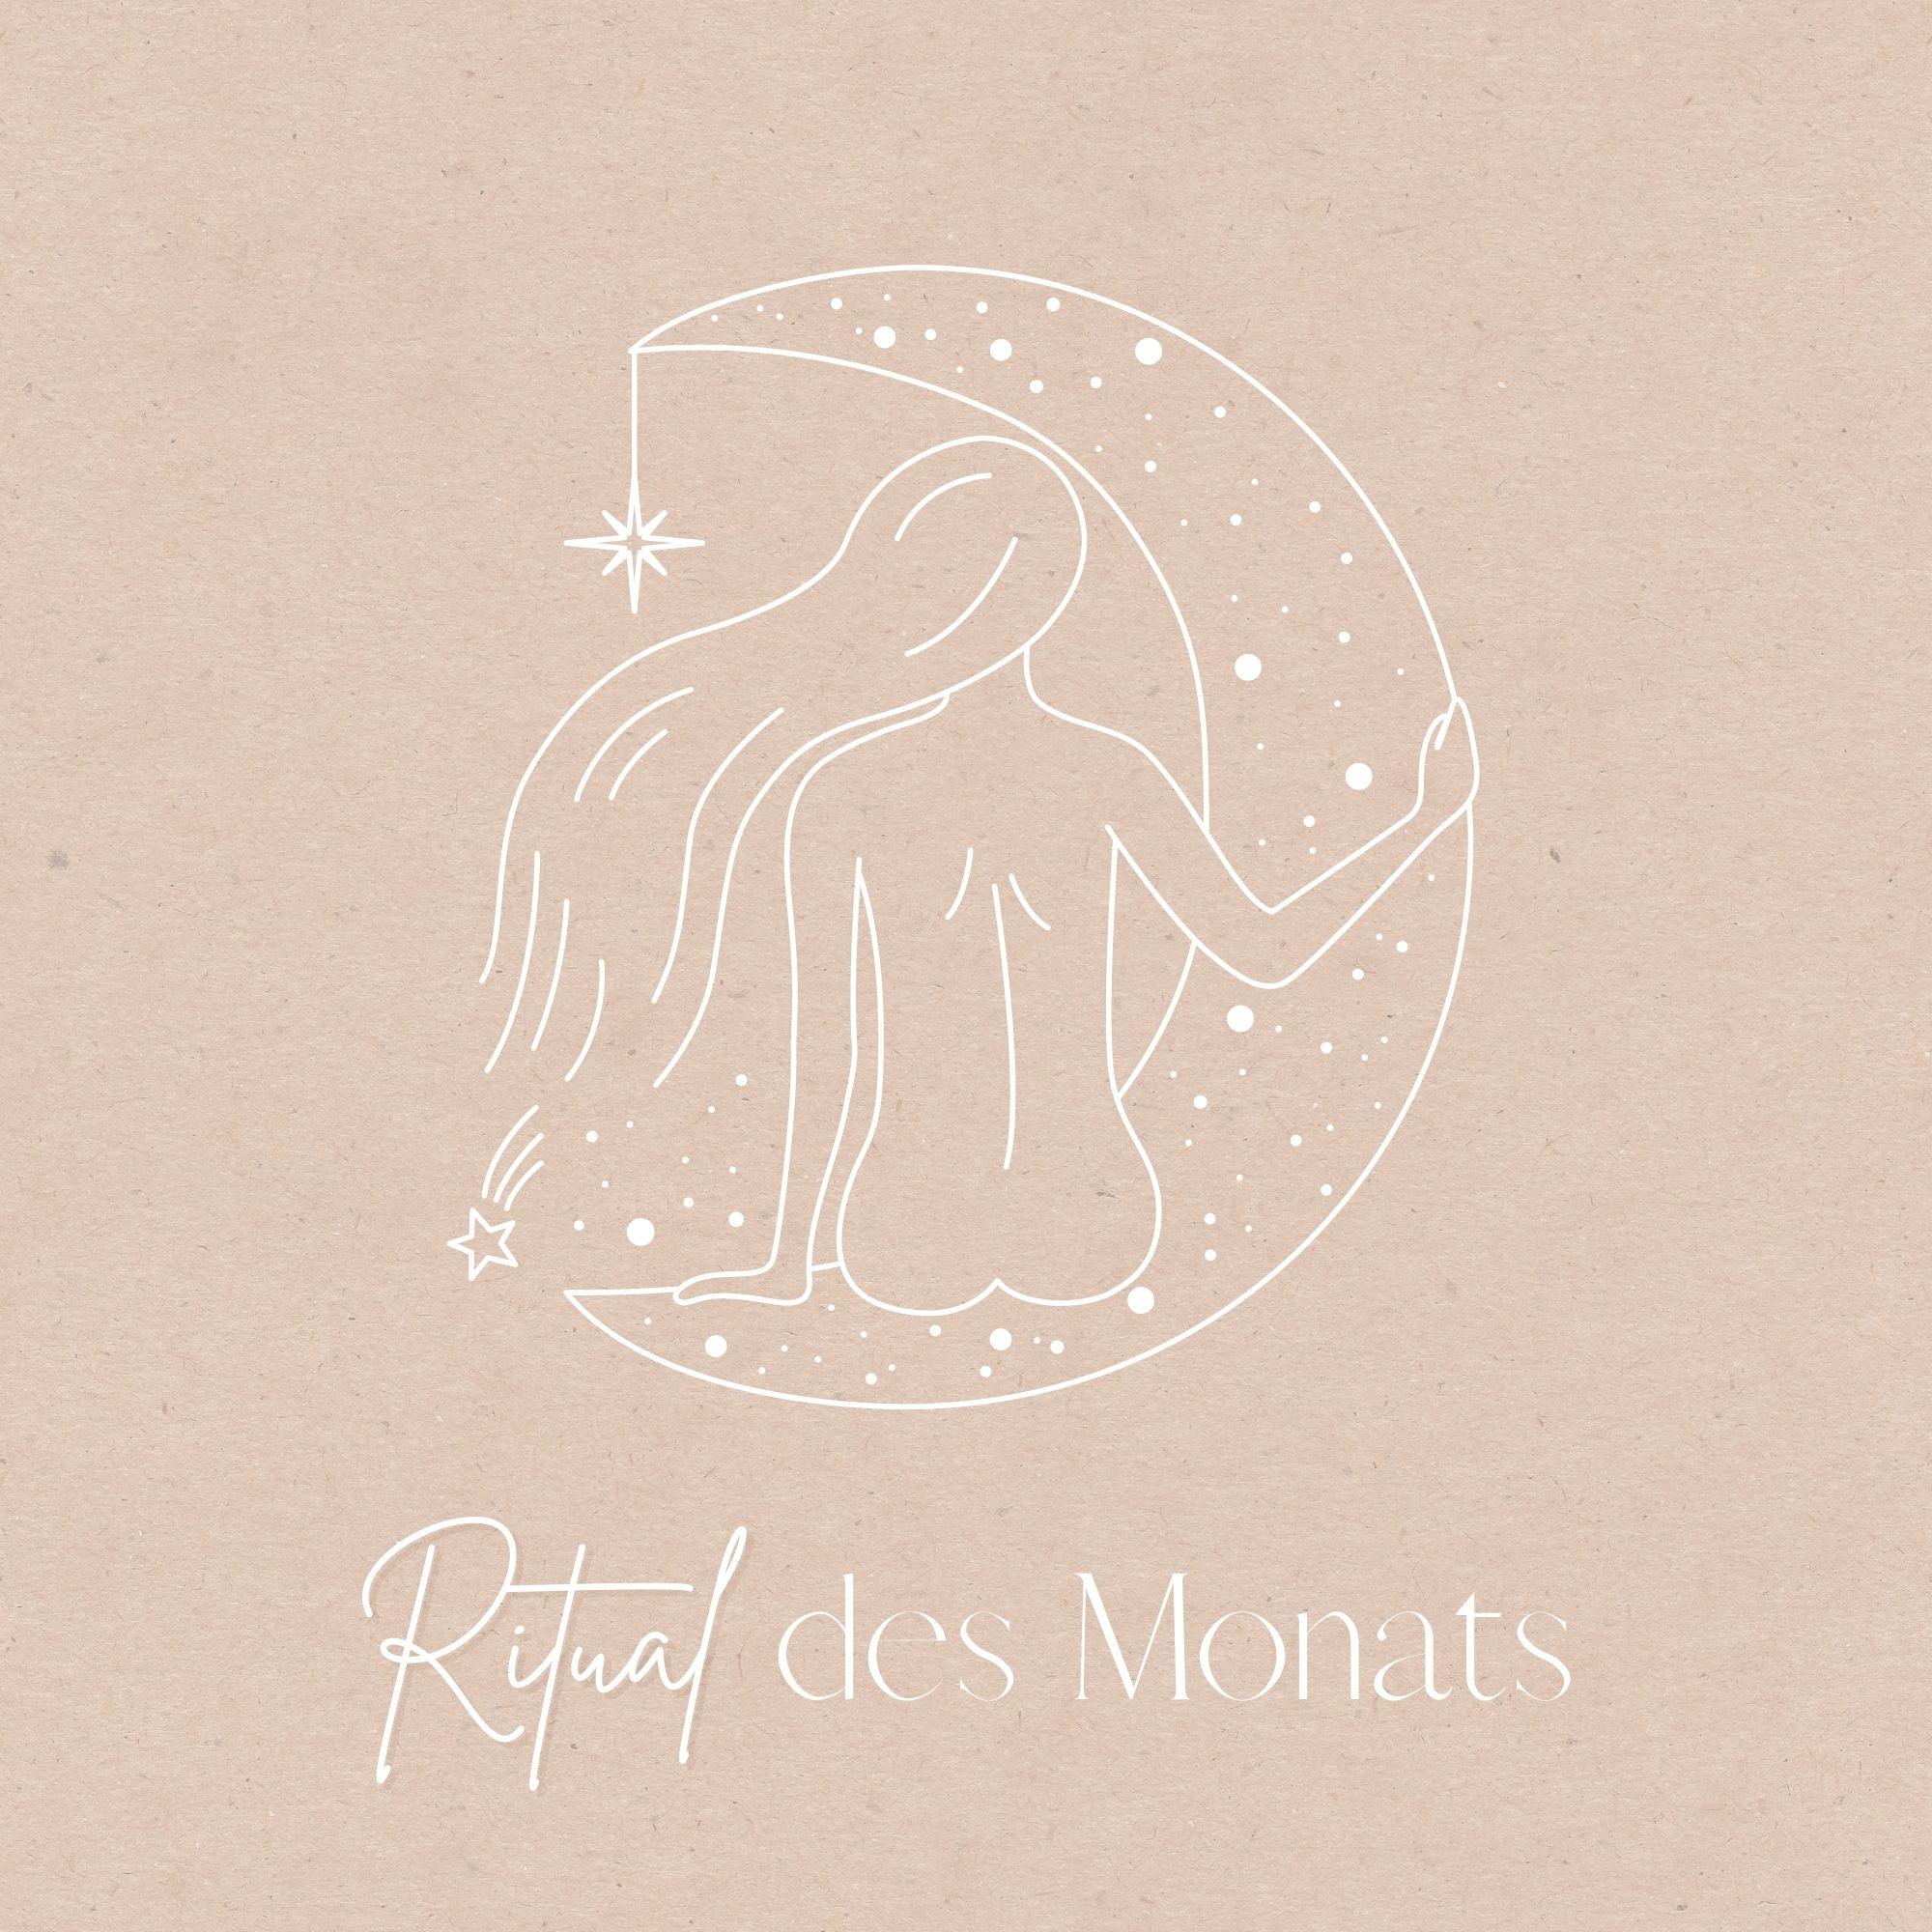 Ritual des Monats